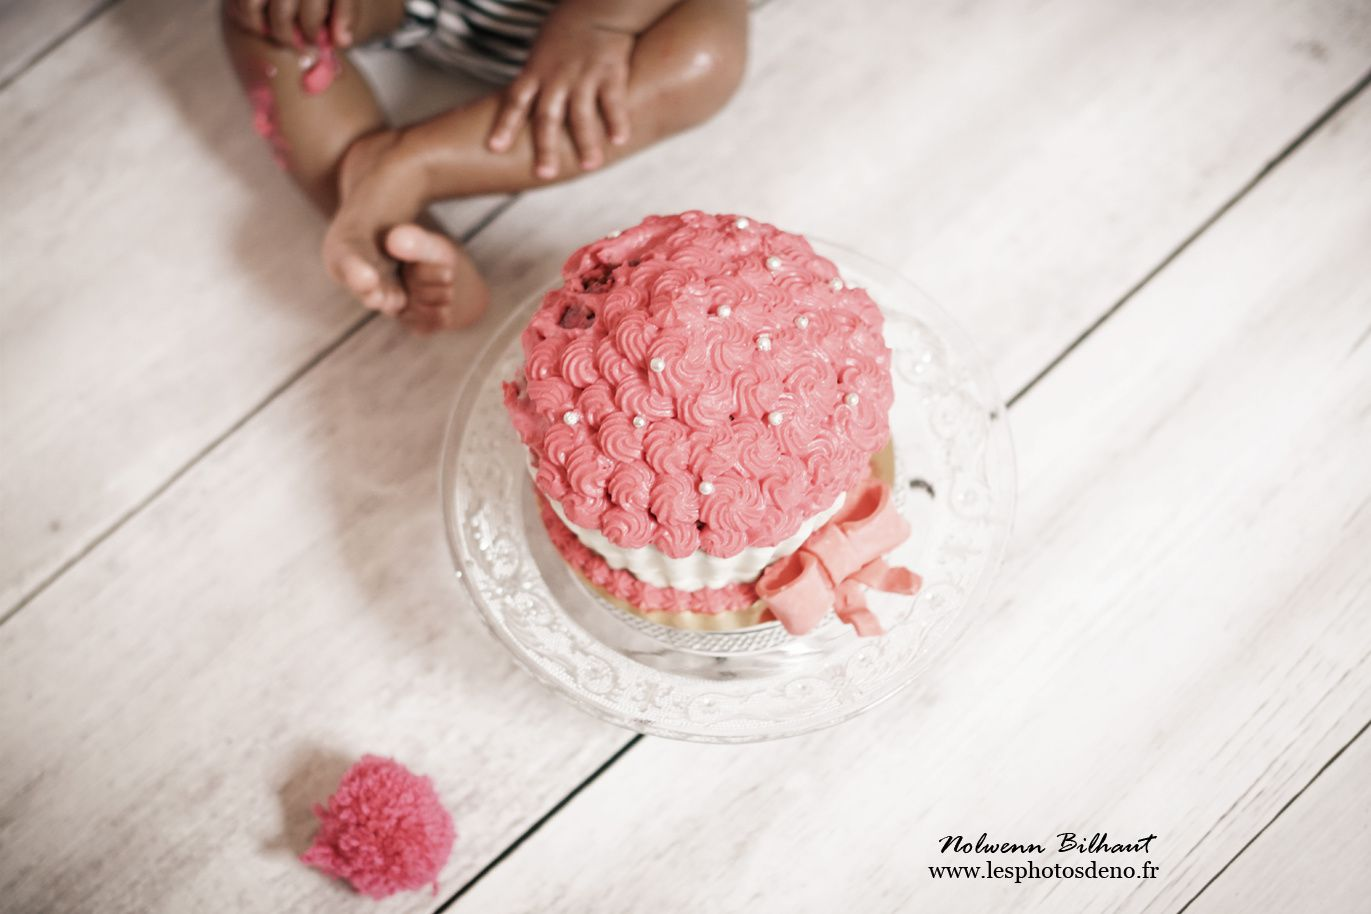 Smash the cake de Kiara, au studio de Nolwenn Bilhaut photographe